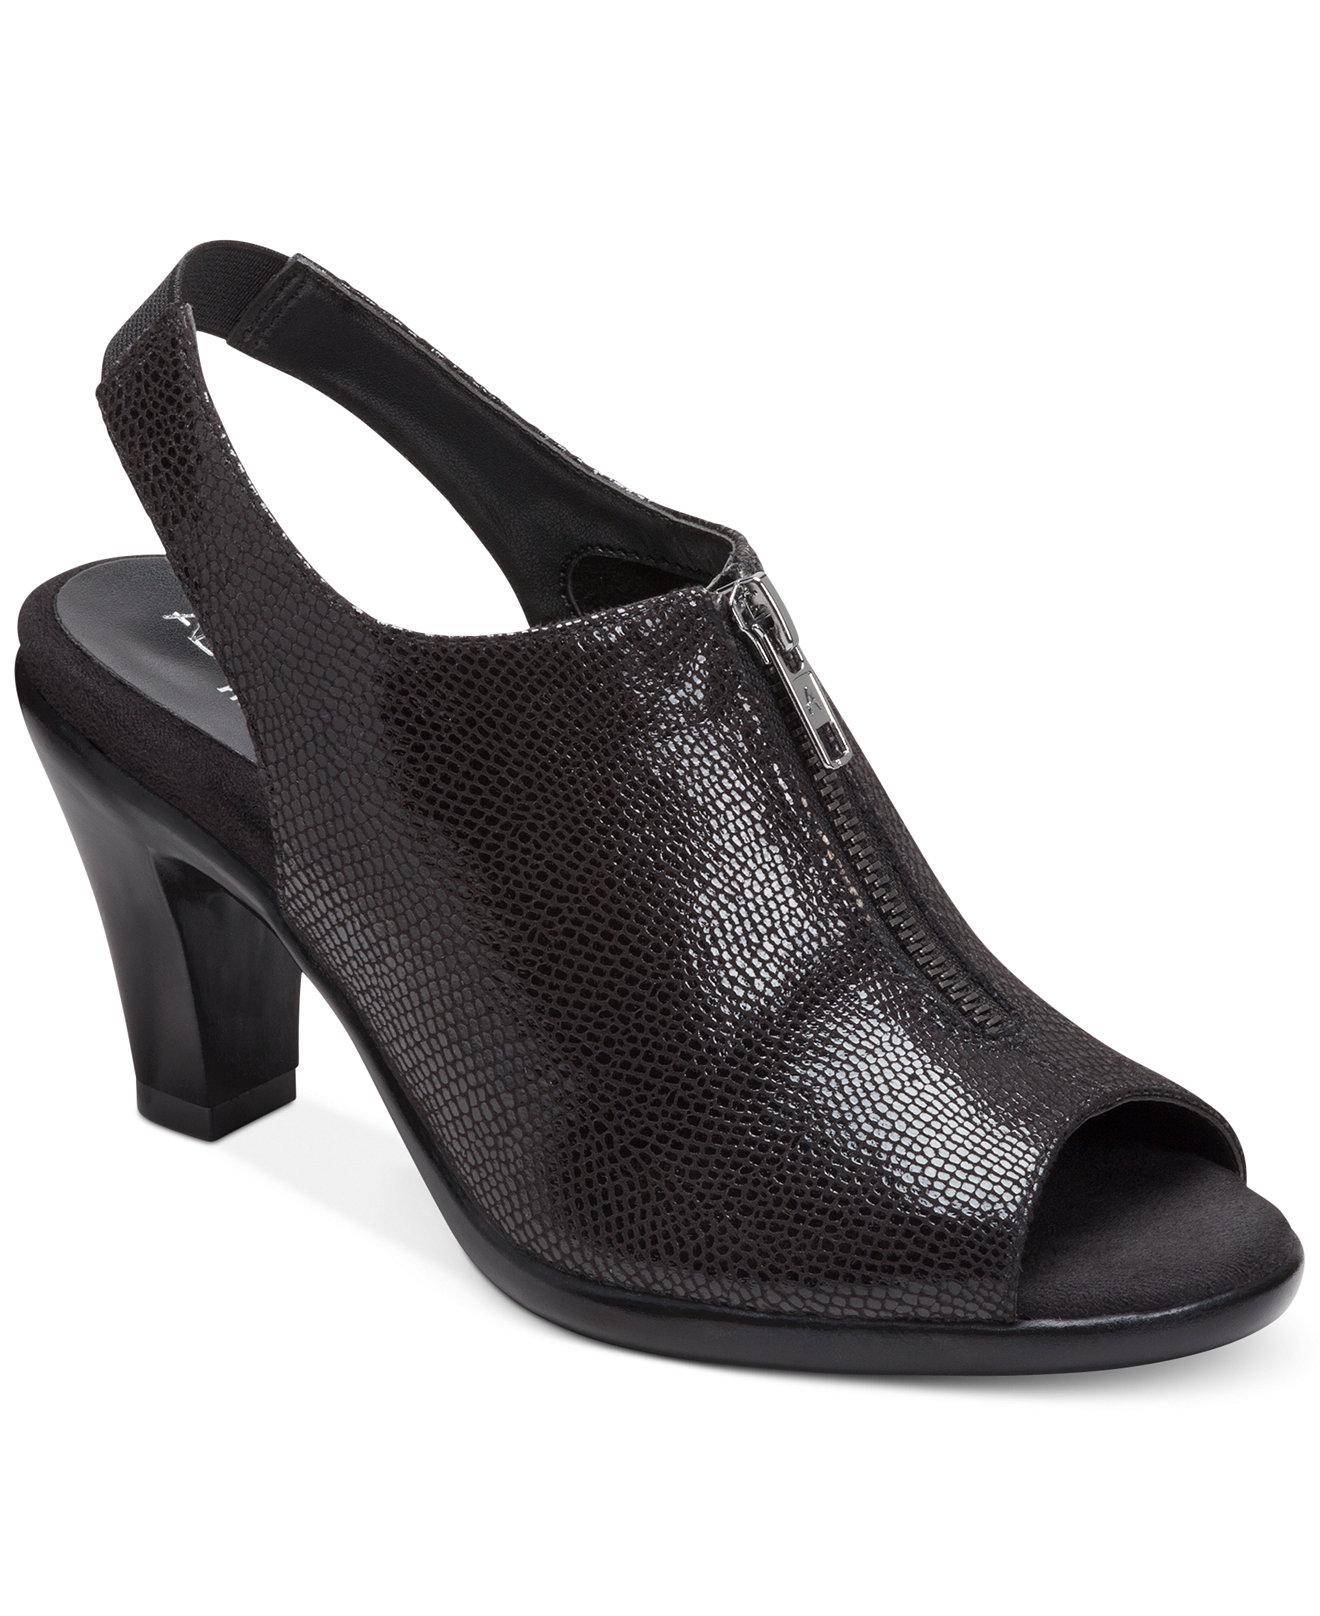 Cheap Dress Shoes Women